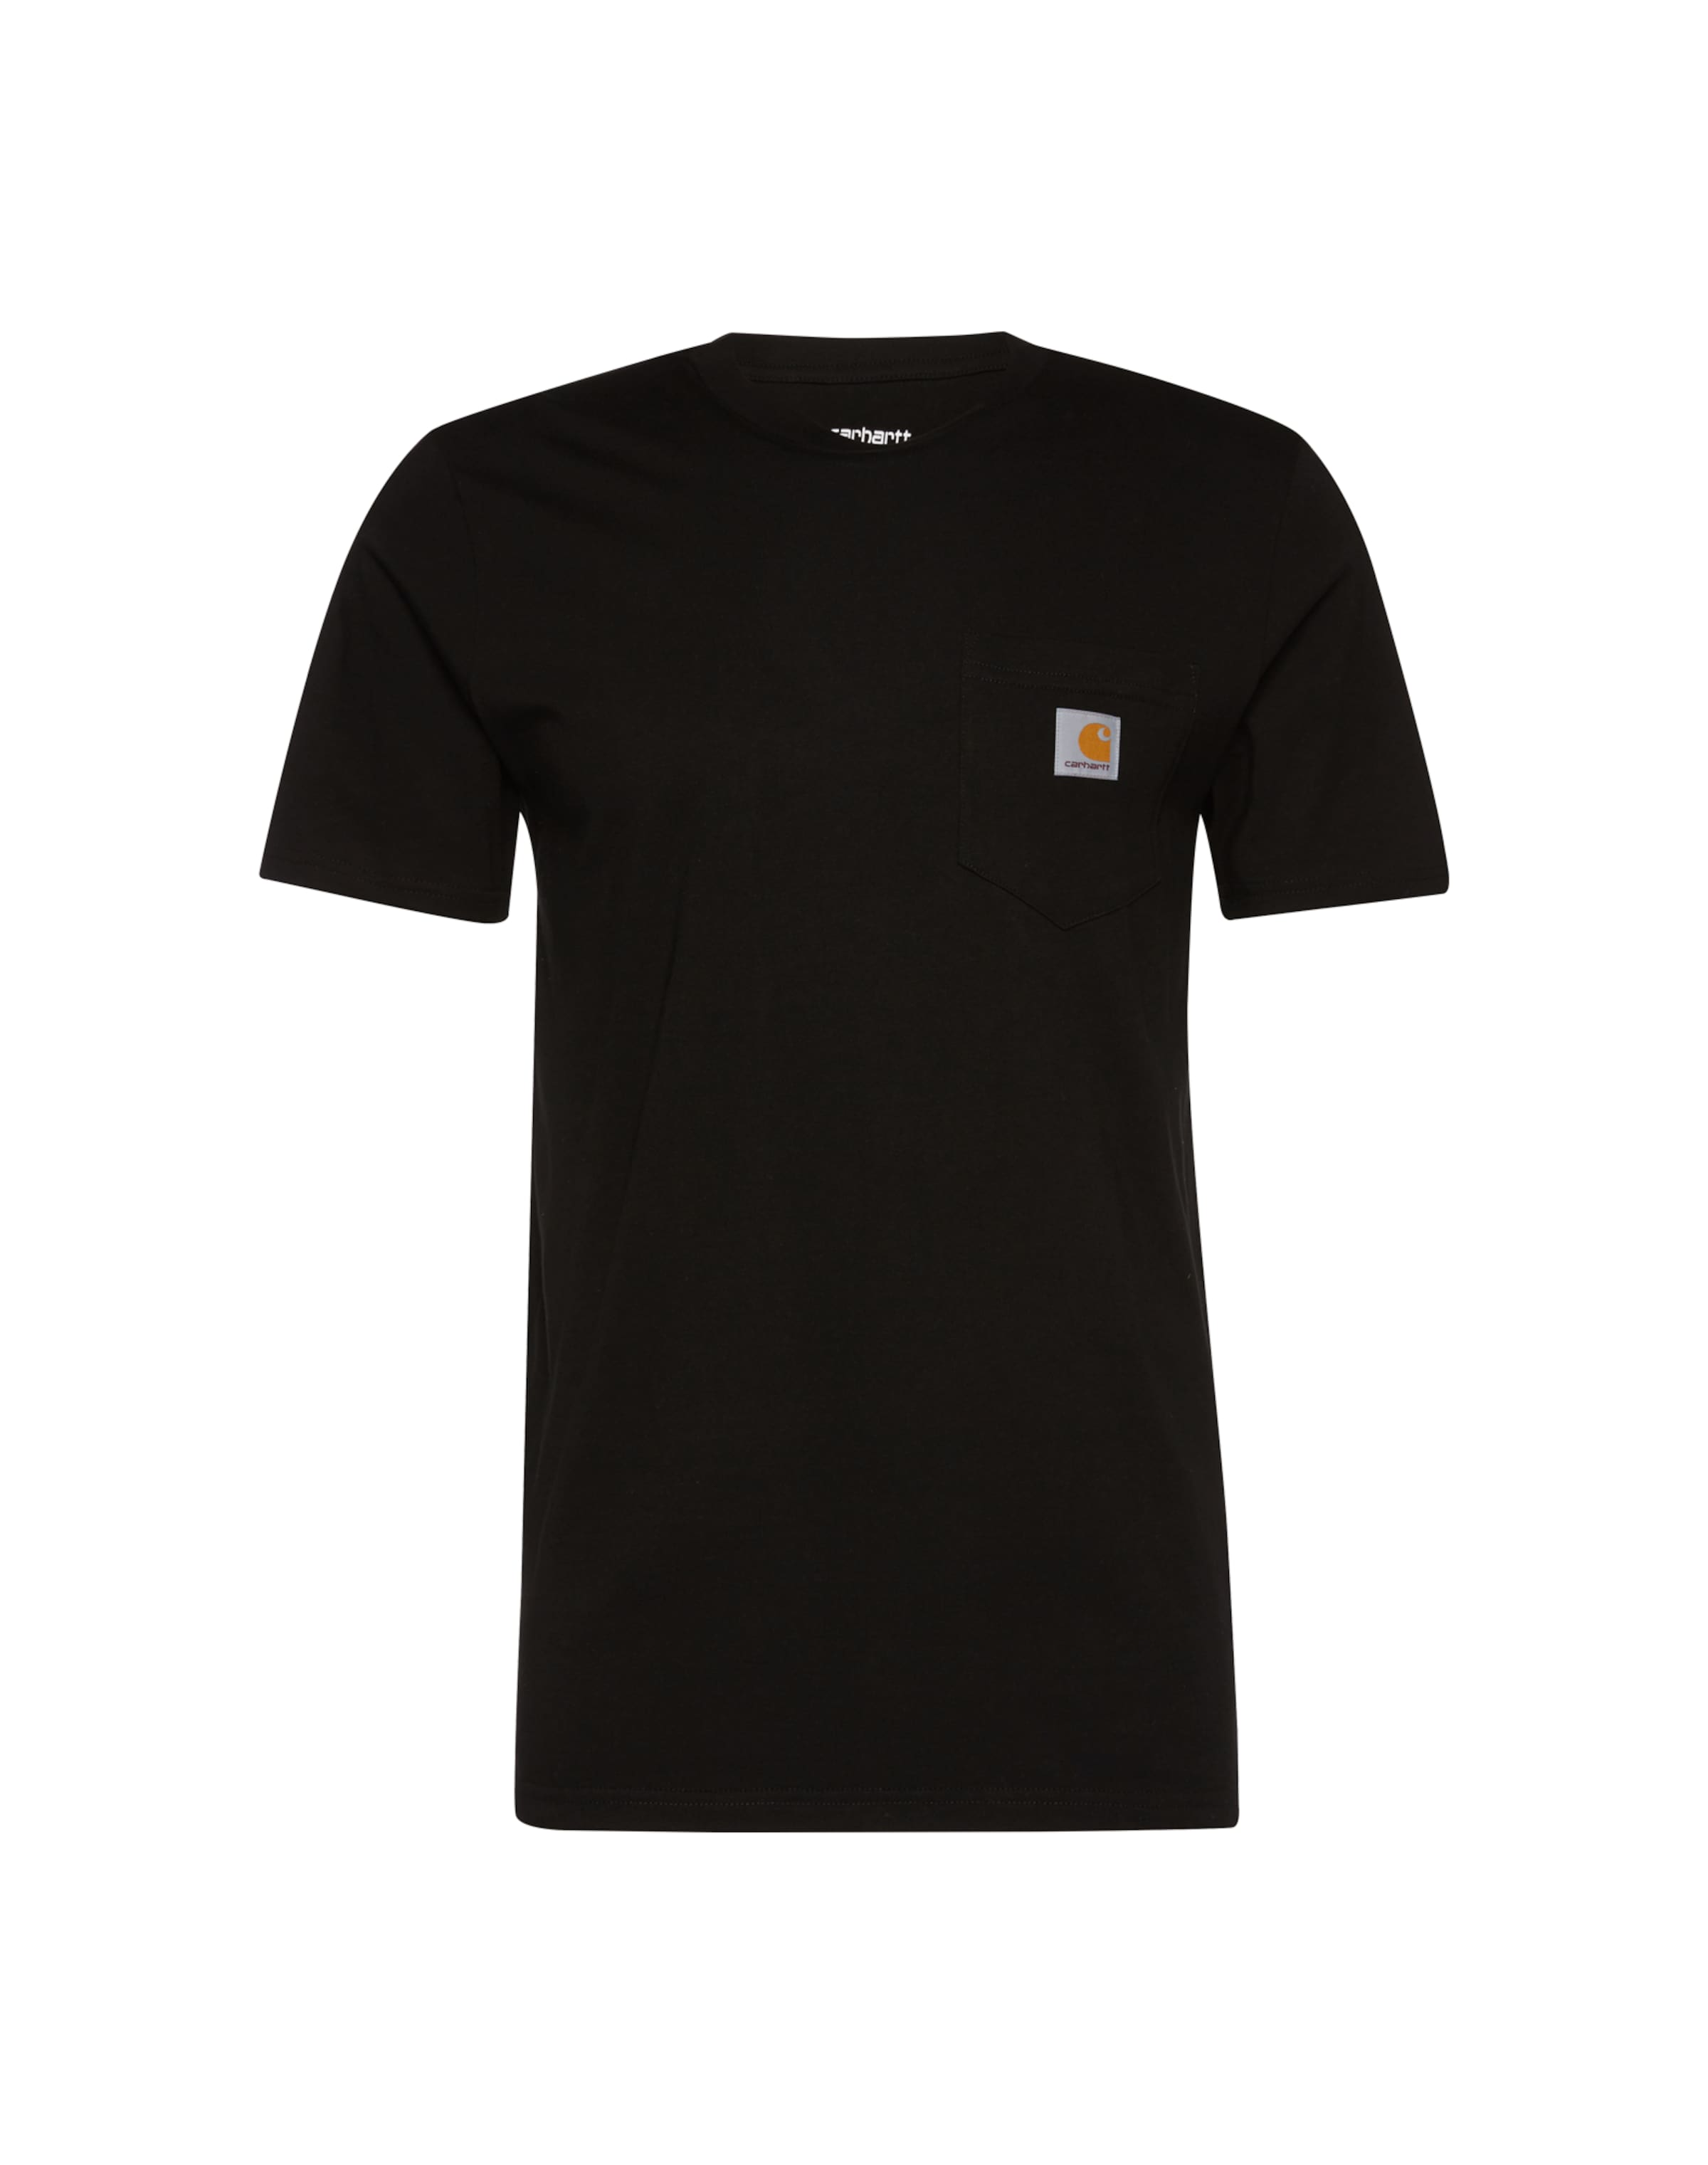 T Carhartt Wip En Noir shirt kP8wn0O